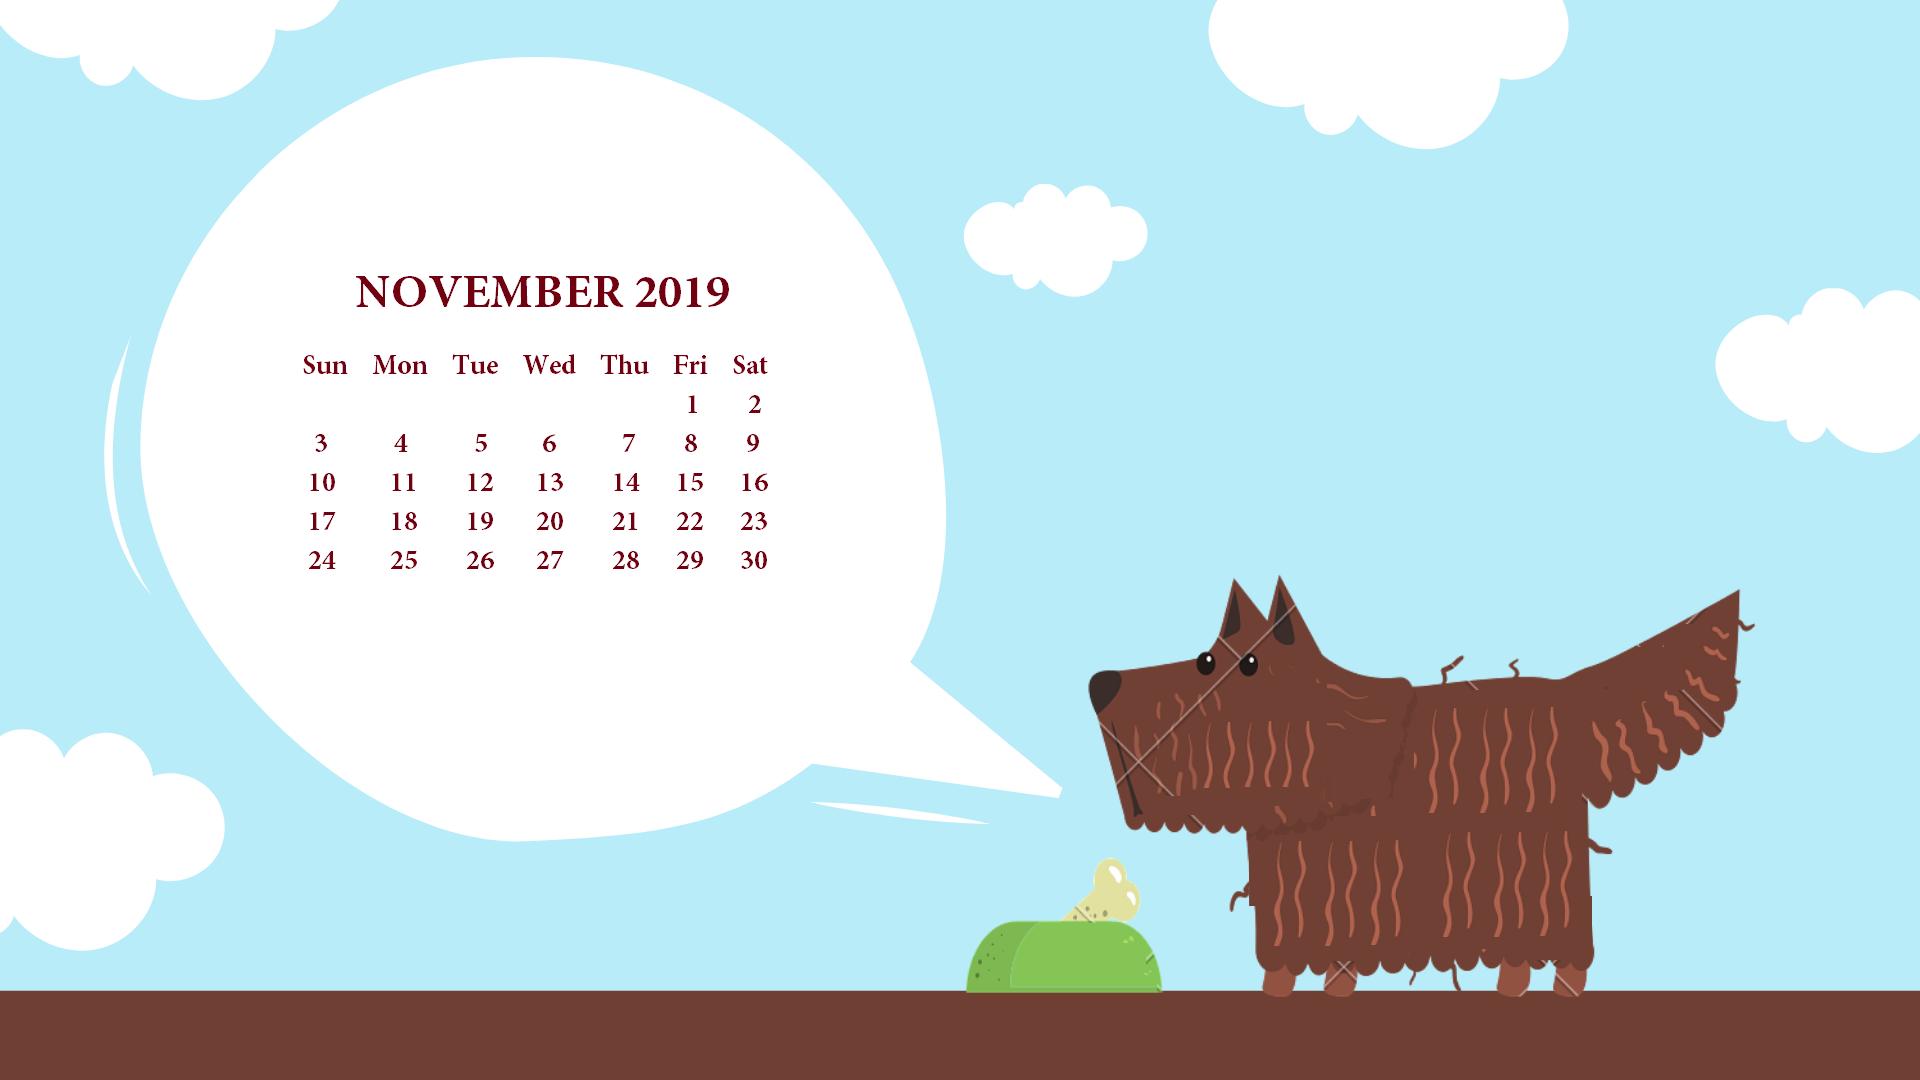 November Calendar 2019 Wallpaper